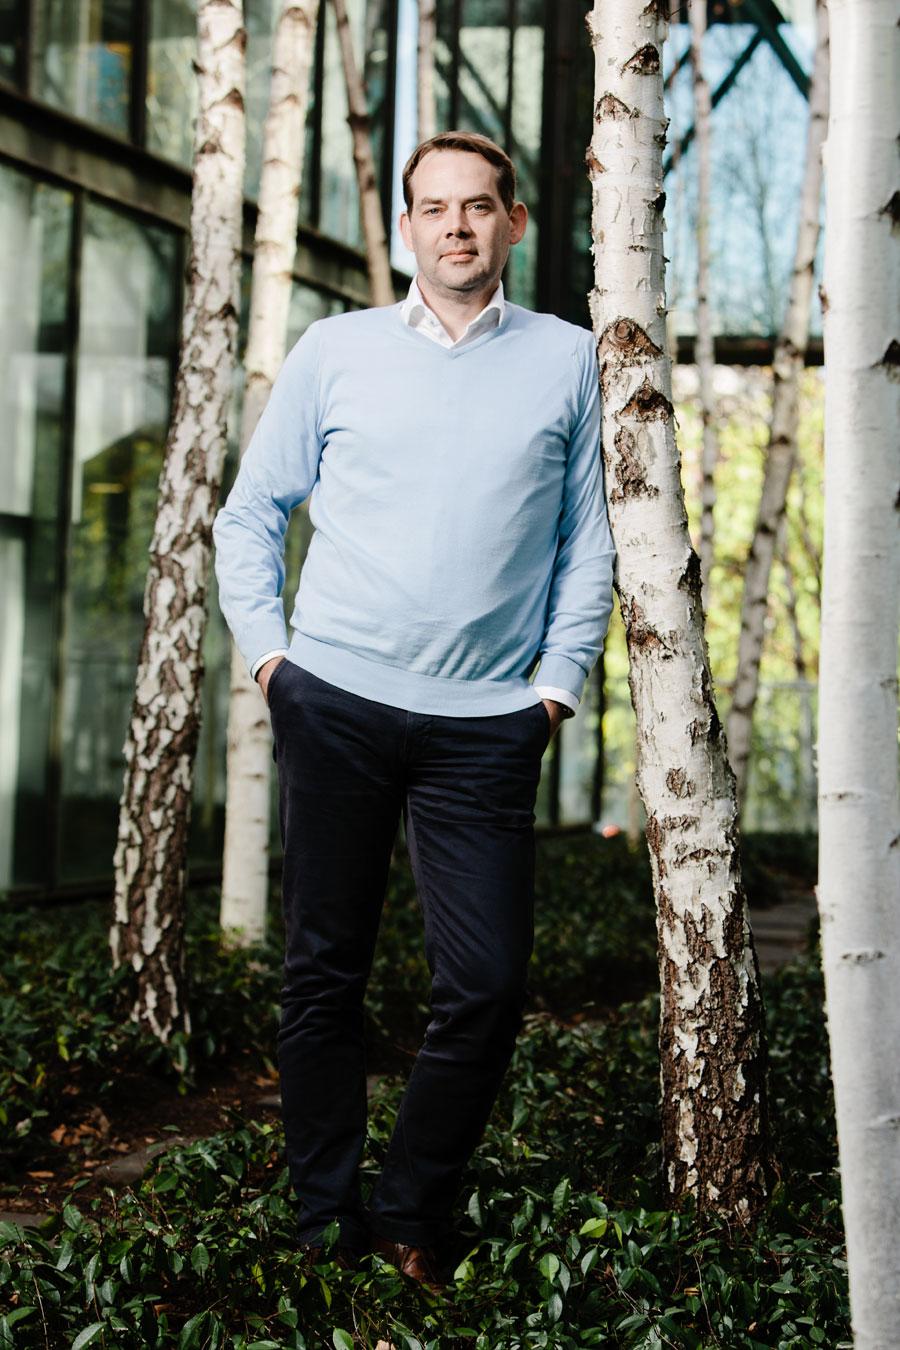 David Gianotten, managing partner at OMA